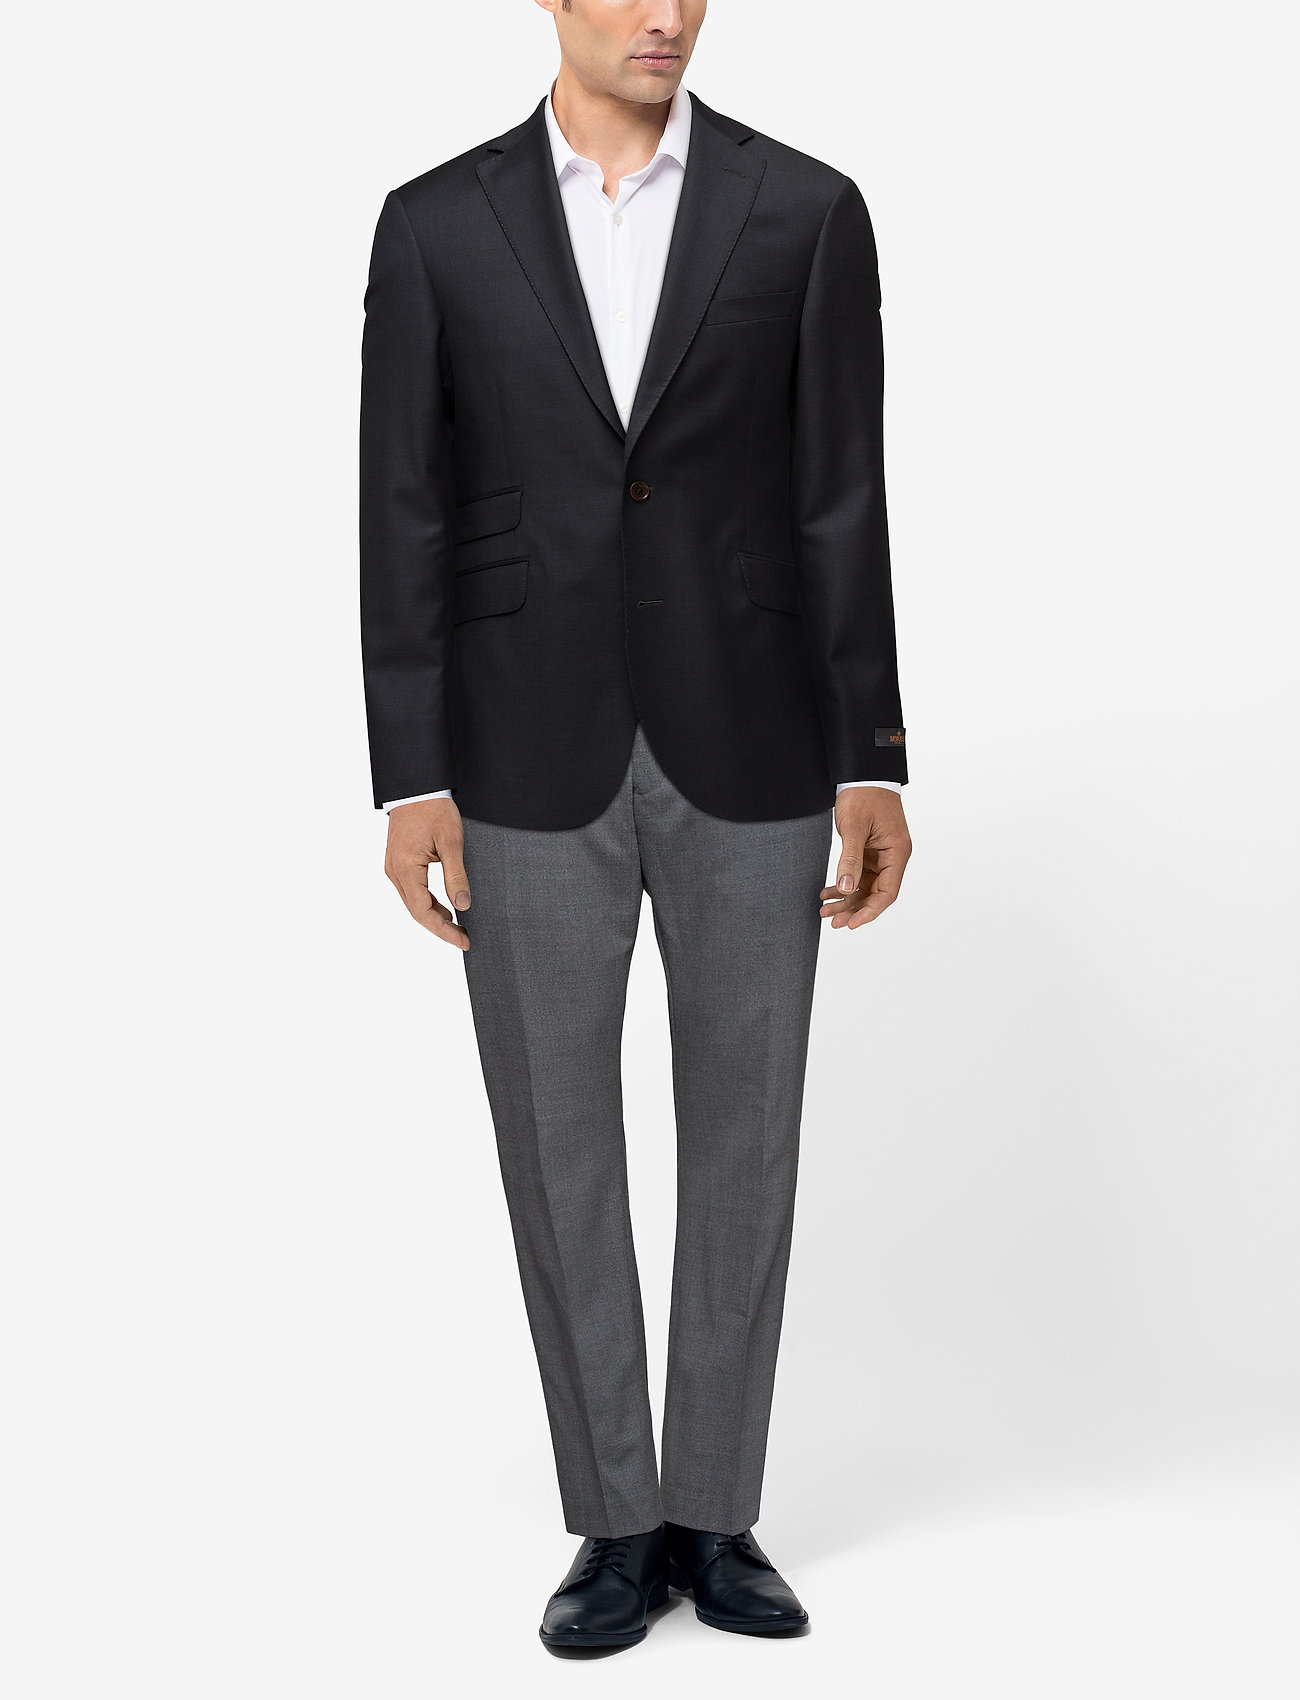 Morris Paul Solid Suit Blazer - GREY